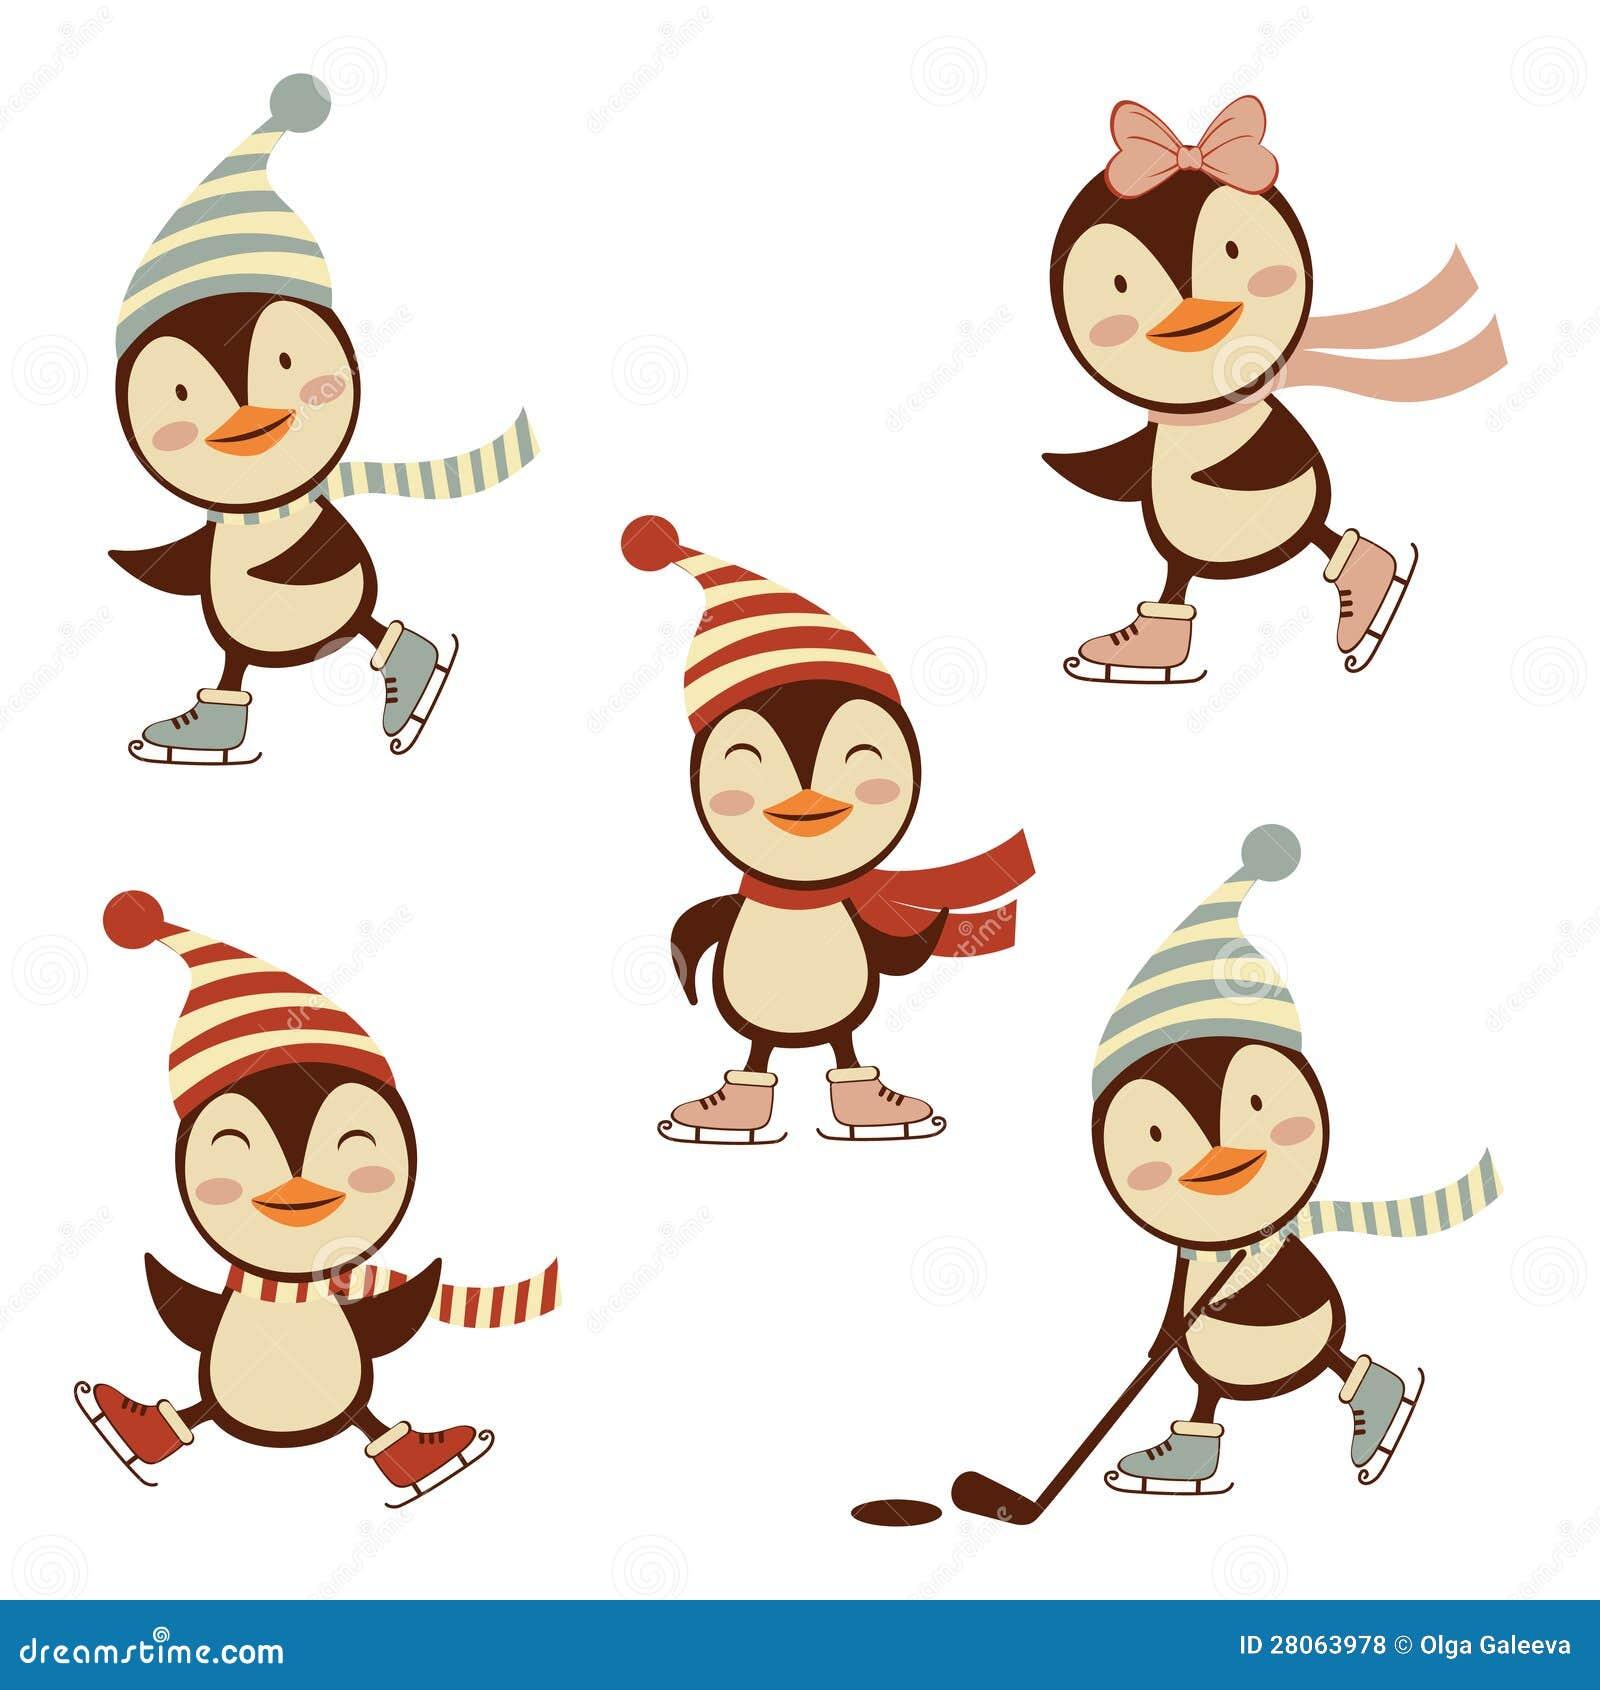 Cute Ice Skating Pengu...